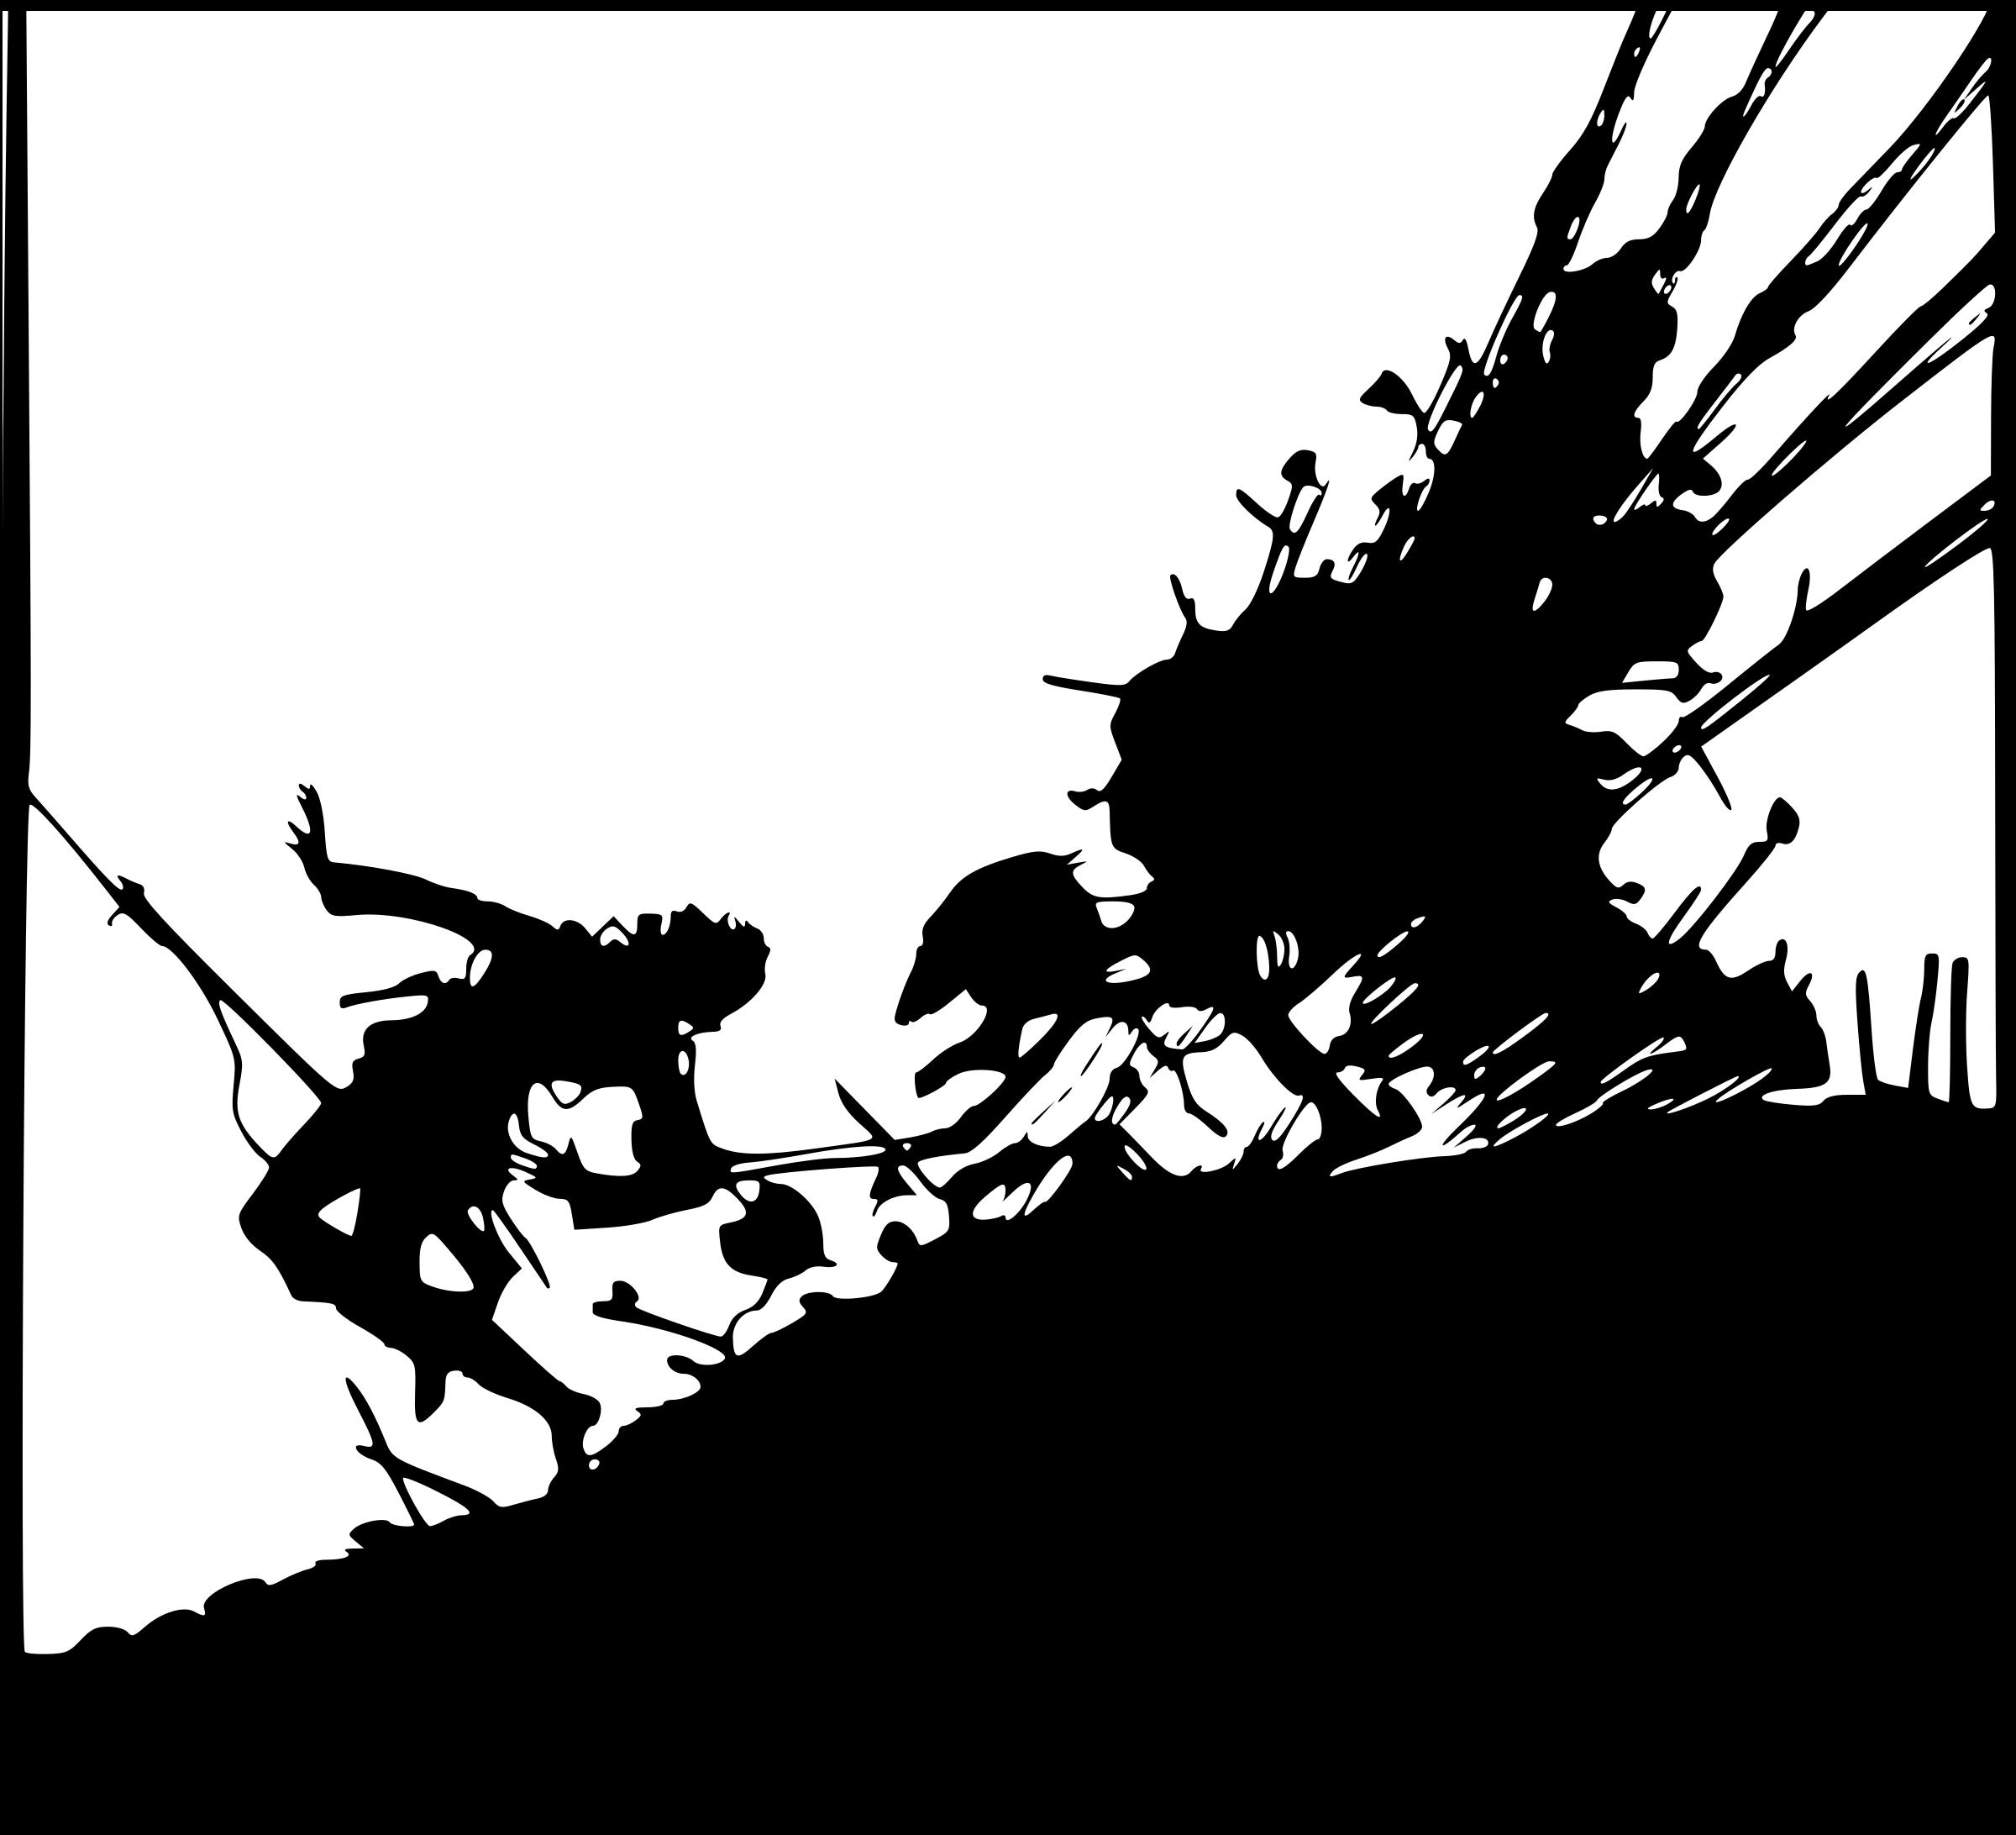 Kriegerin svg #2, Download drawings